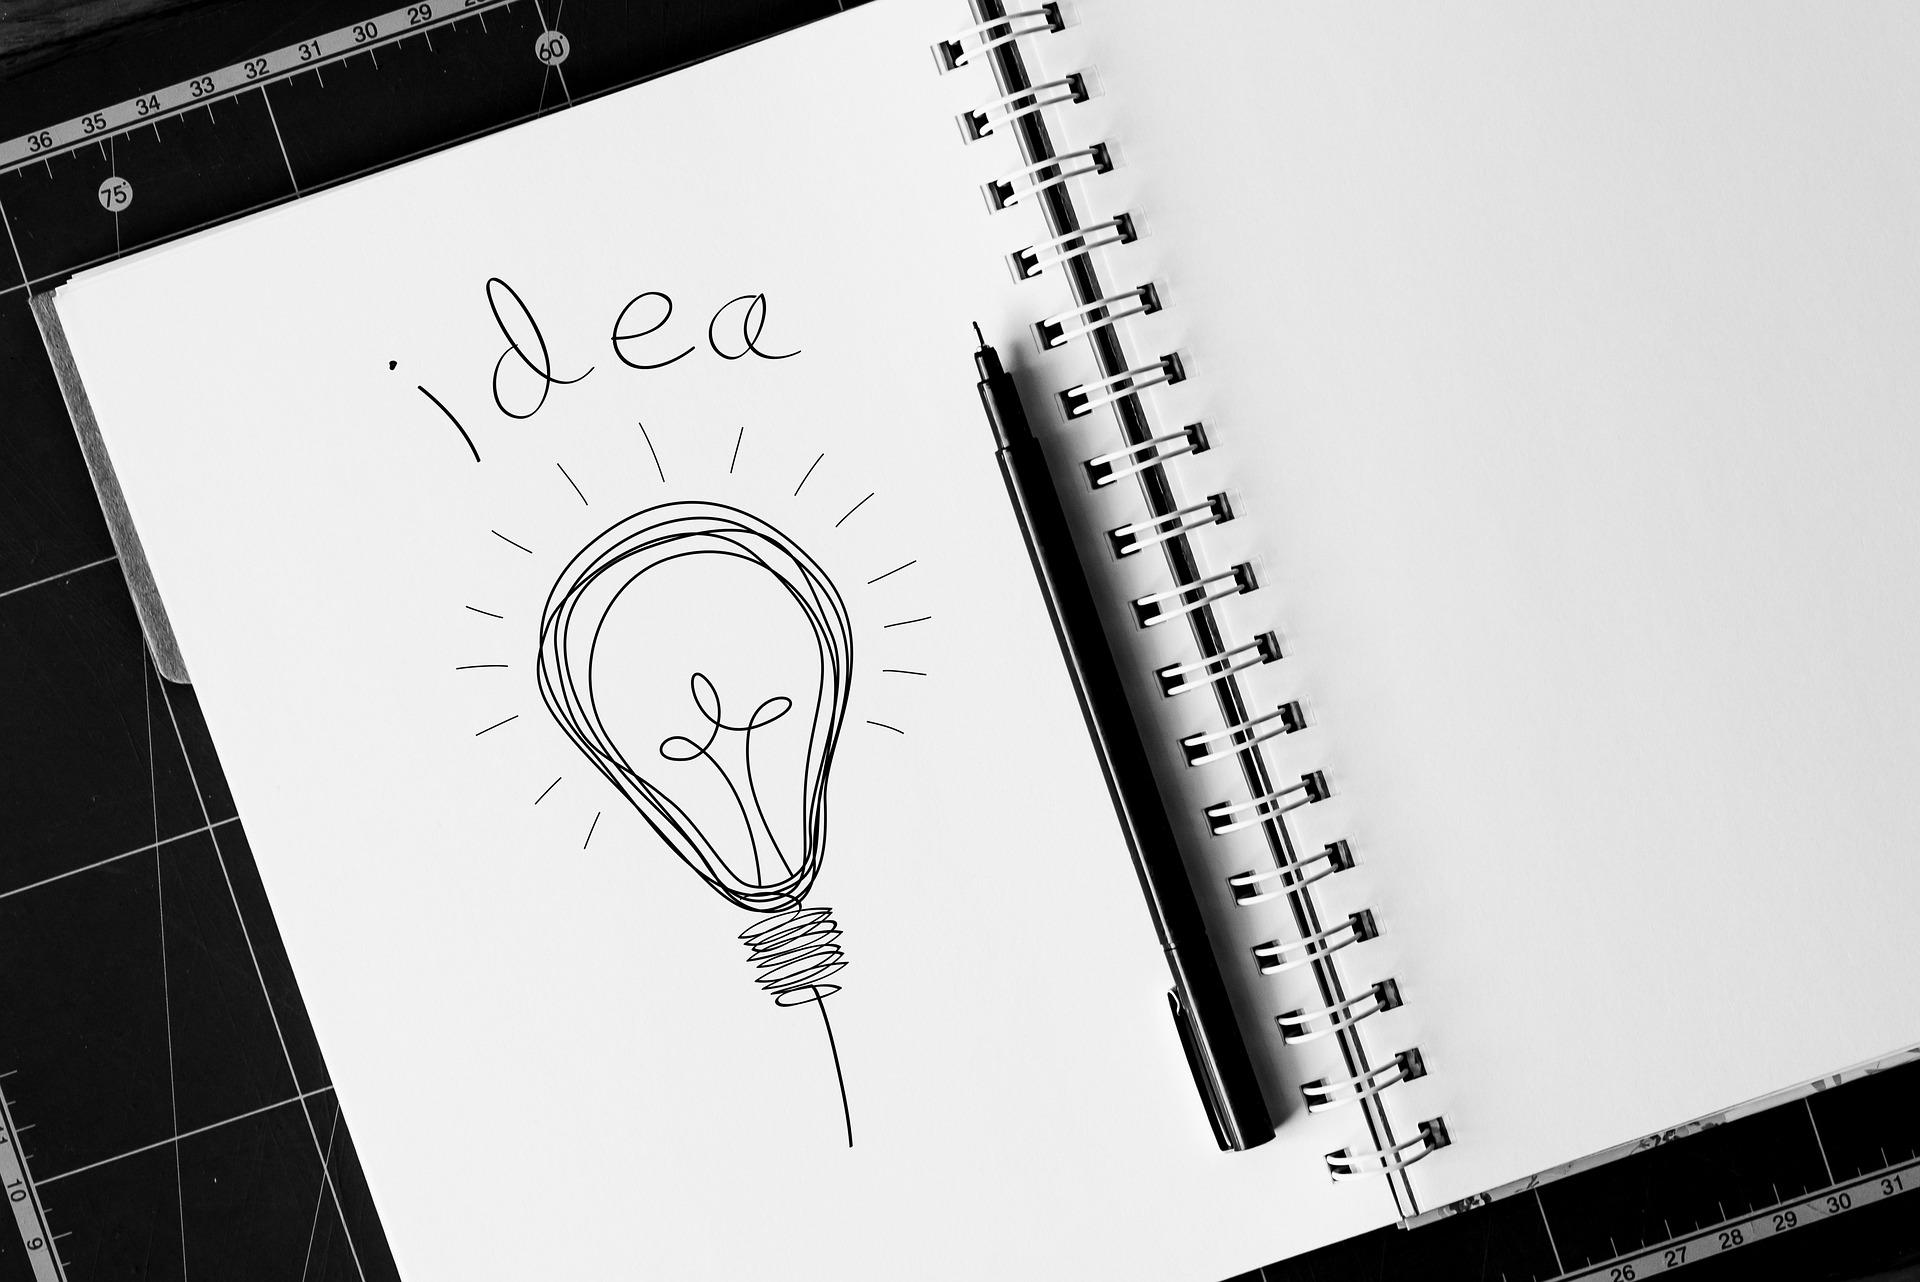 idea-notepad-and-pen